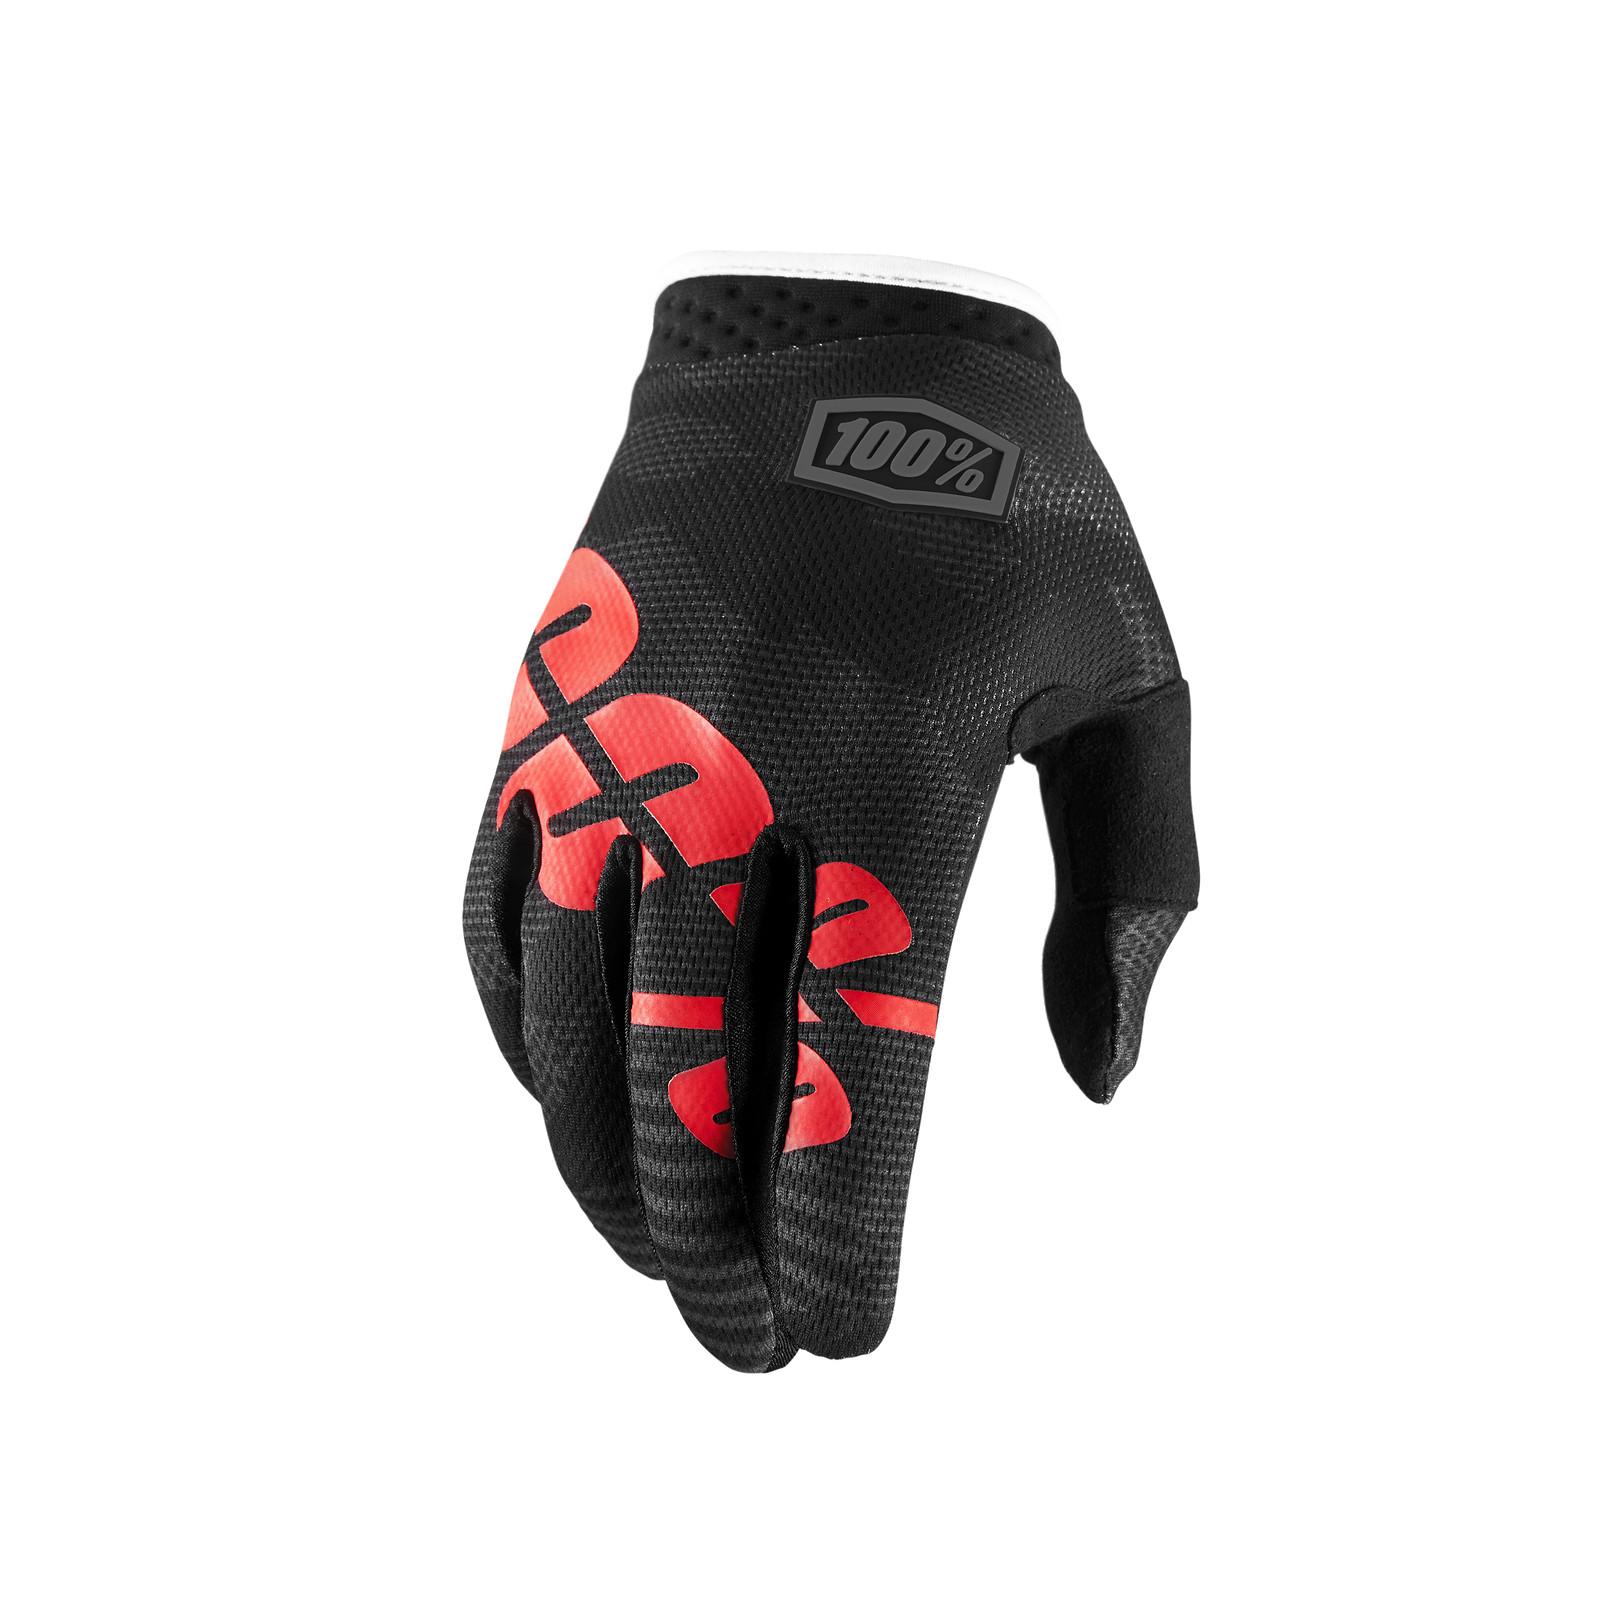 iTrack Glove - Black / Camo - 100percent - Motocross Pictures - Vital MX